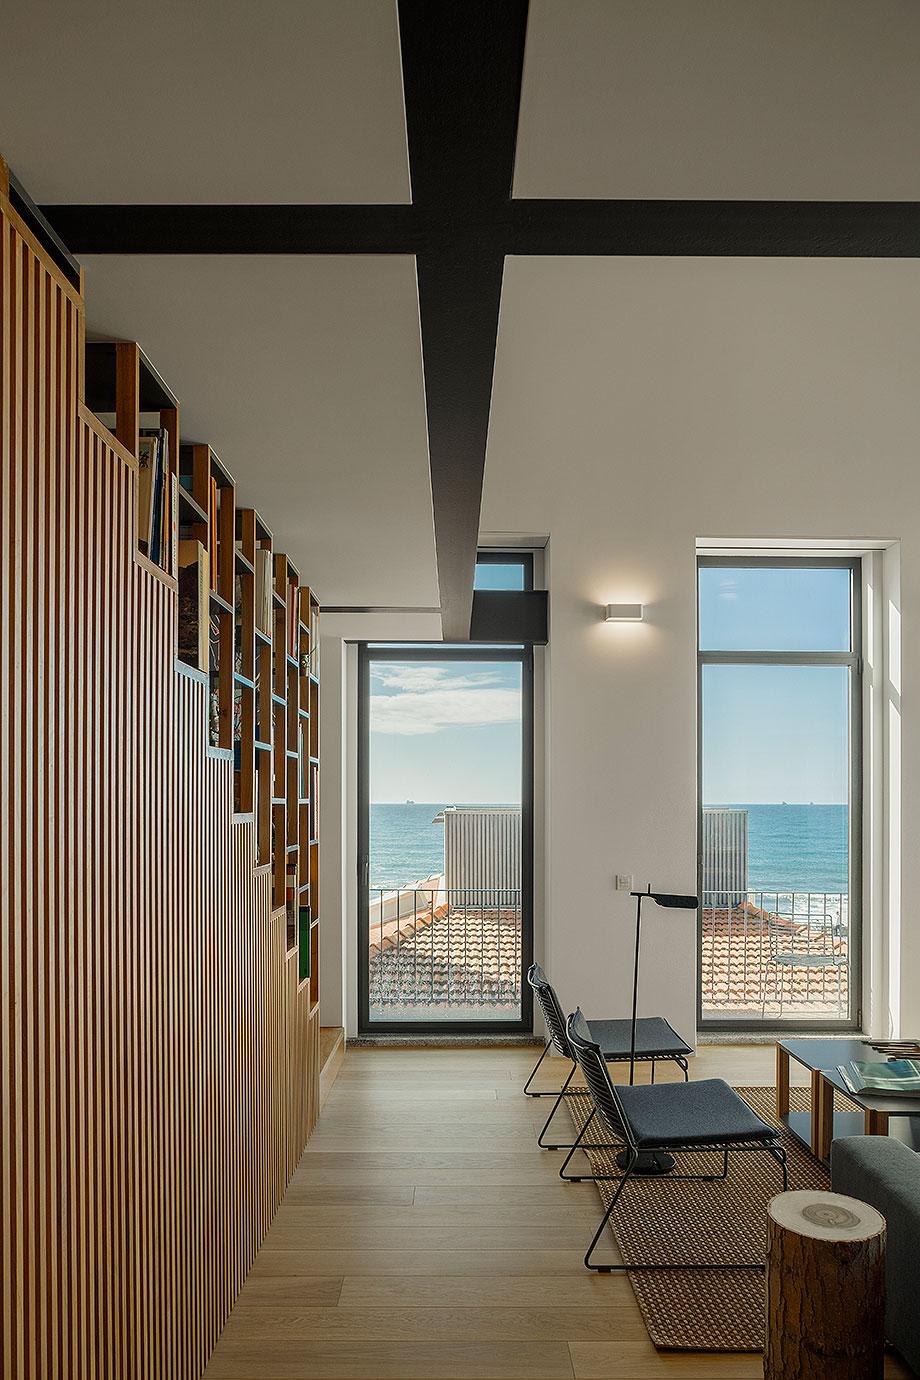 edificio sra da luz en oporto por as arquitecto (12) - foto ivo tavares